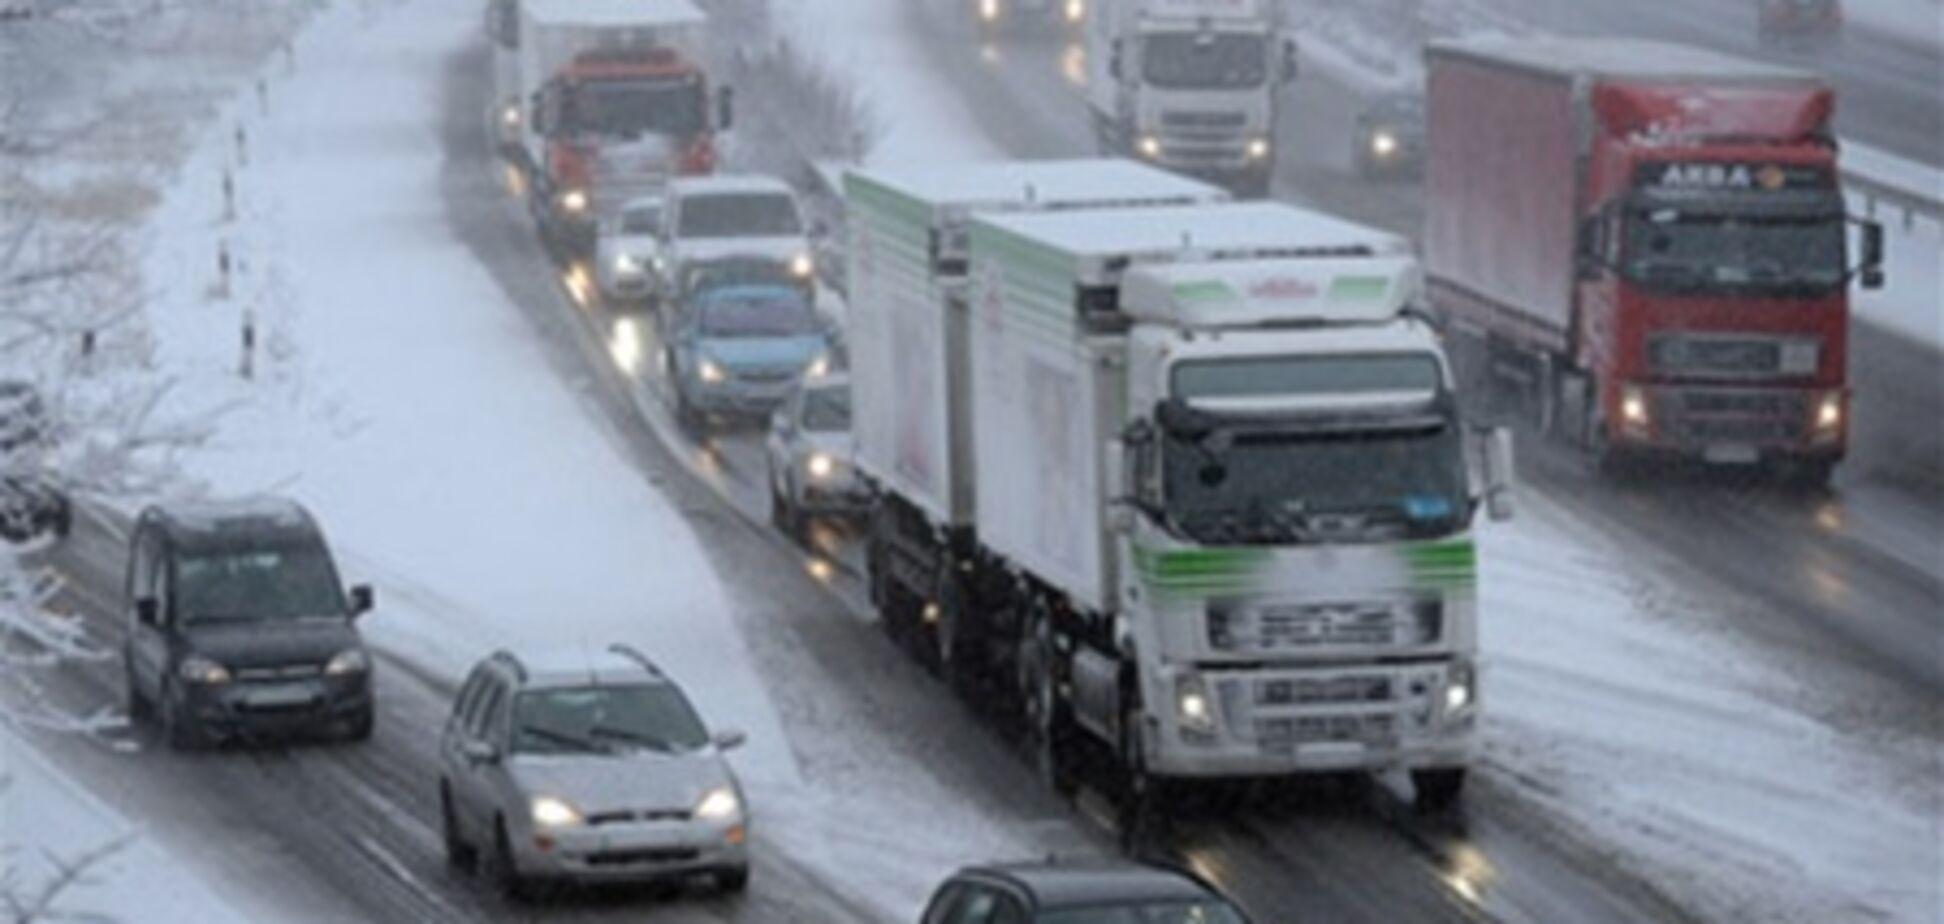 Через центр Киева не надо возить гайки - Целовальник